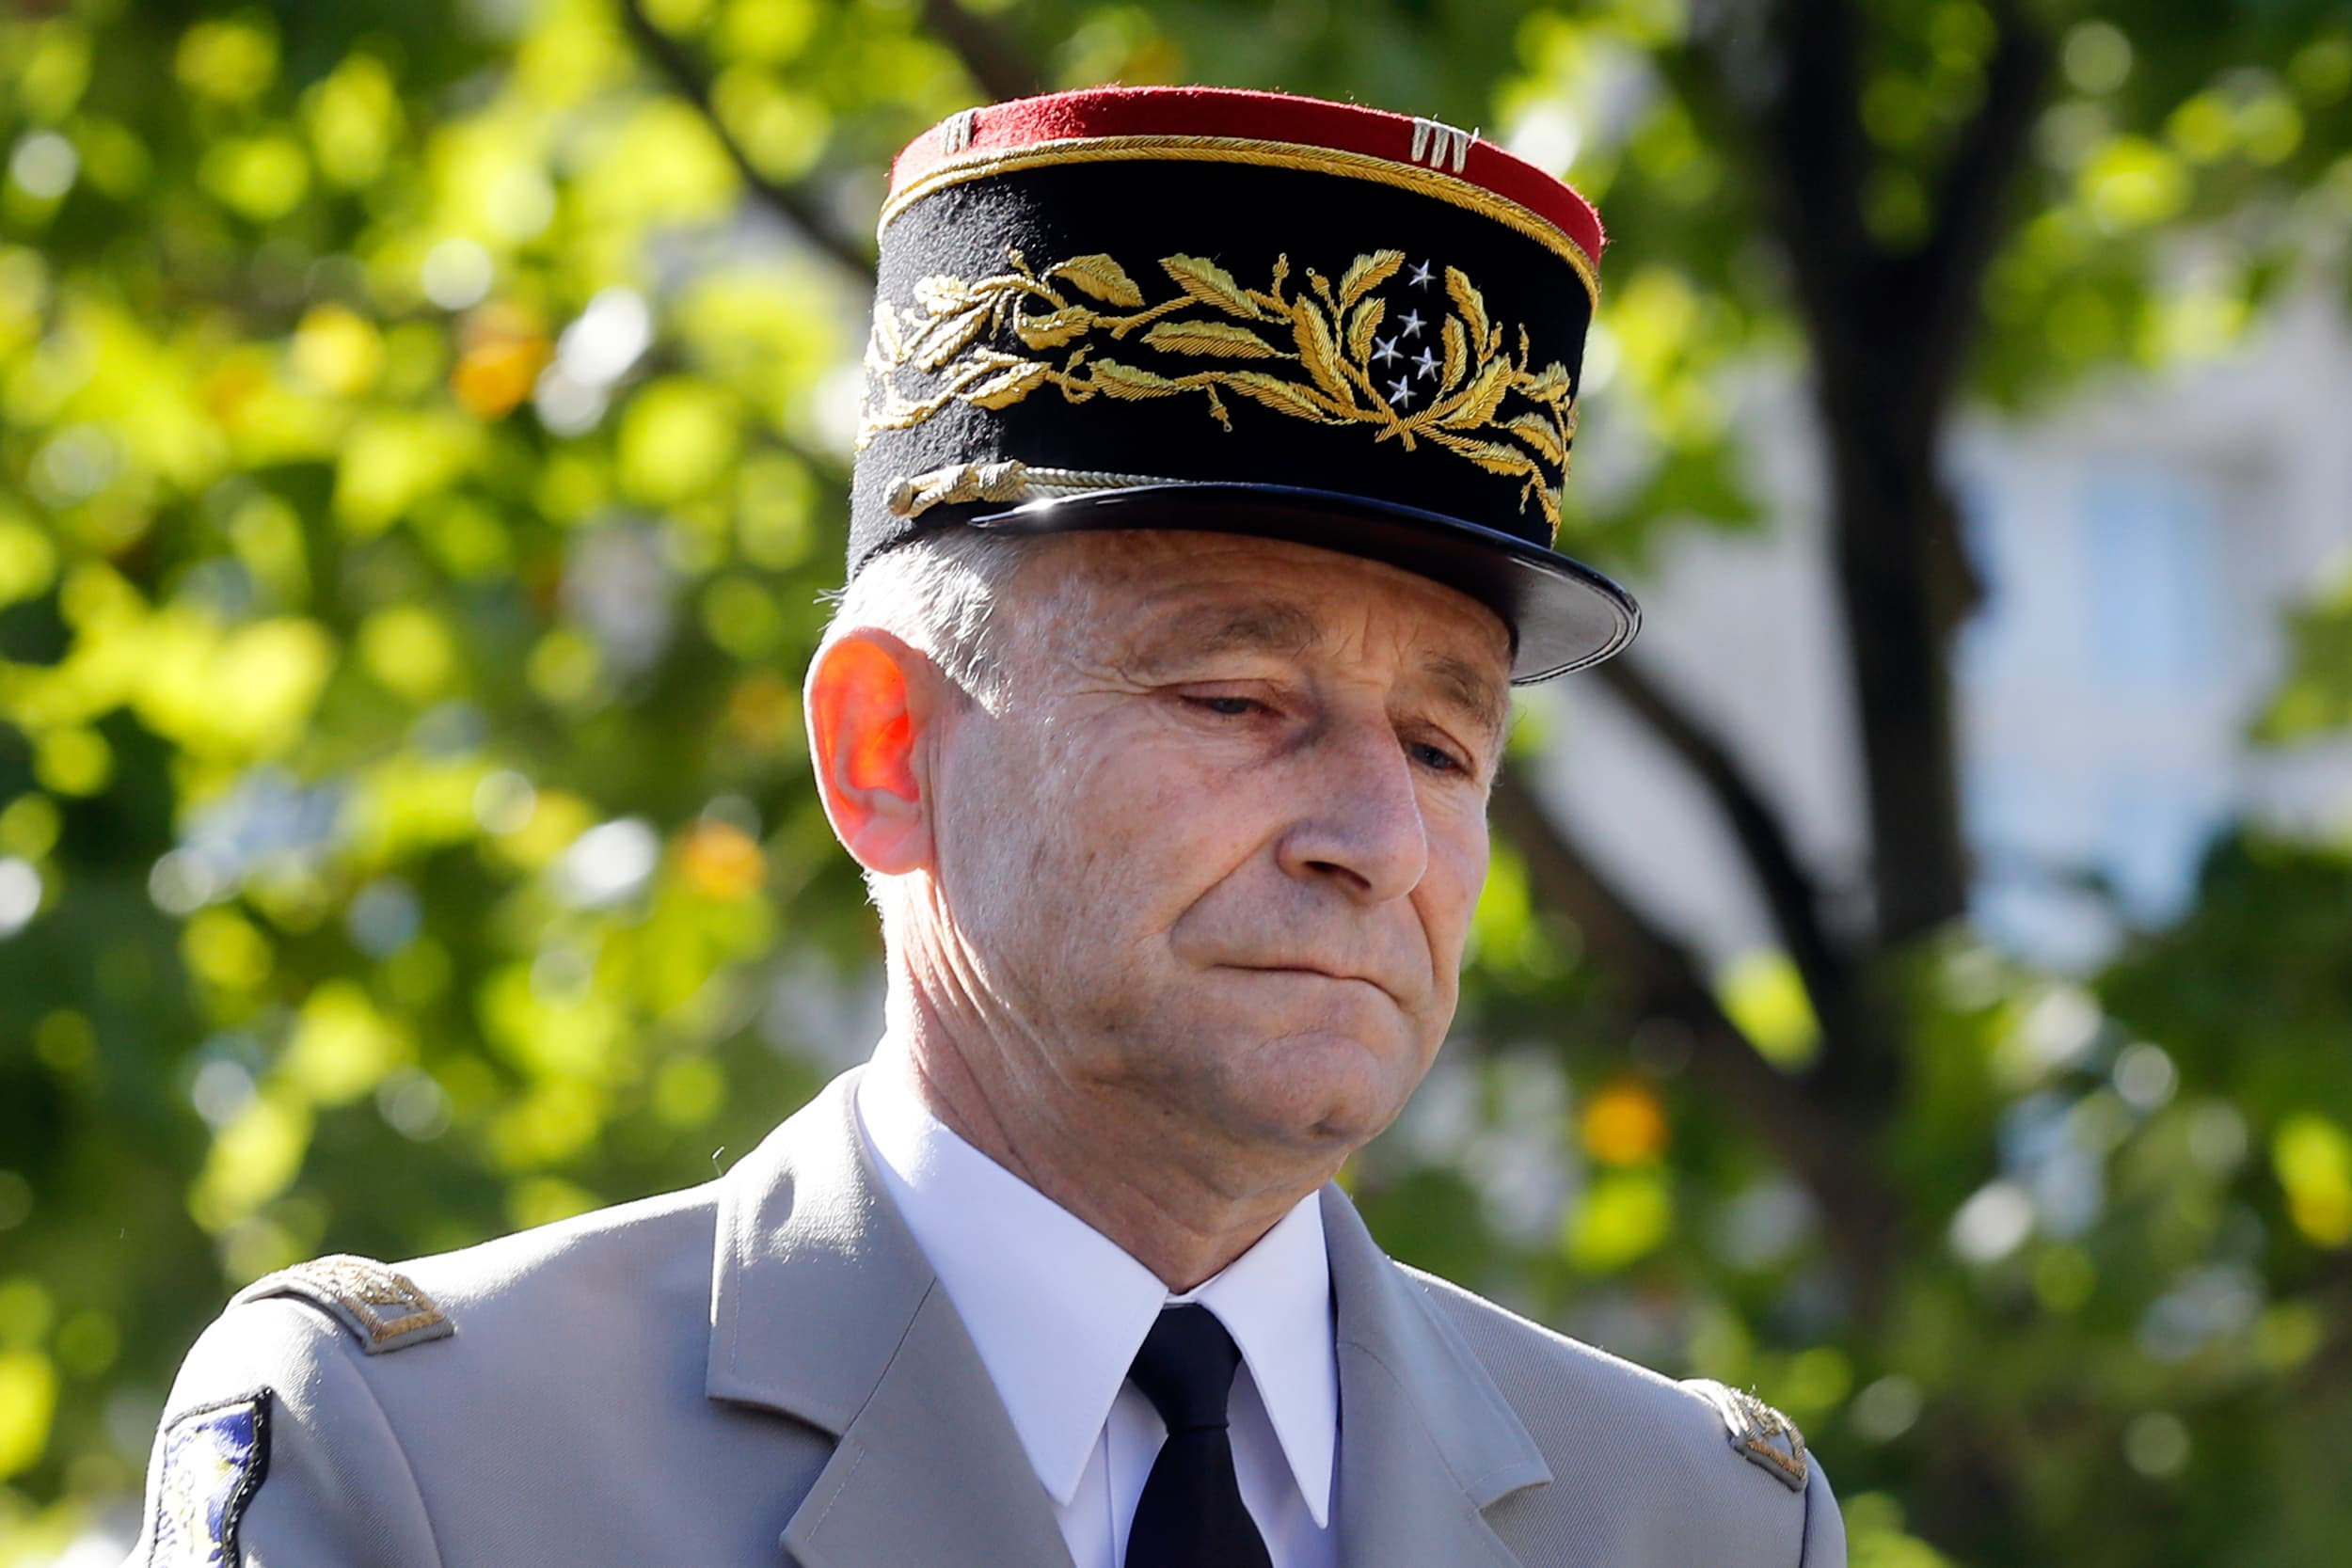 Ranskan armeijan esikuntapäällikkö, kenraali Pierre de Villiers.